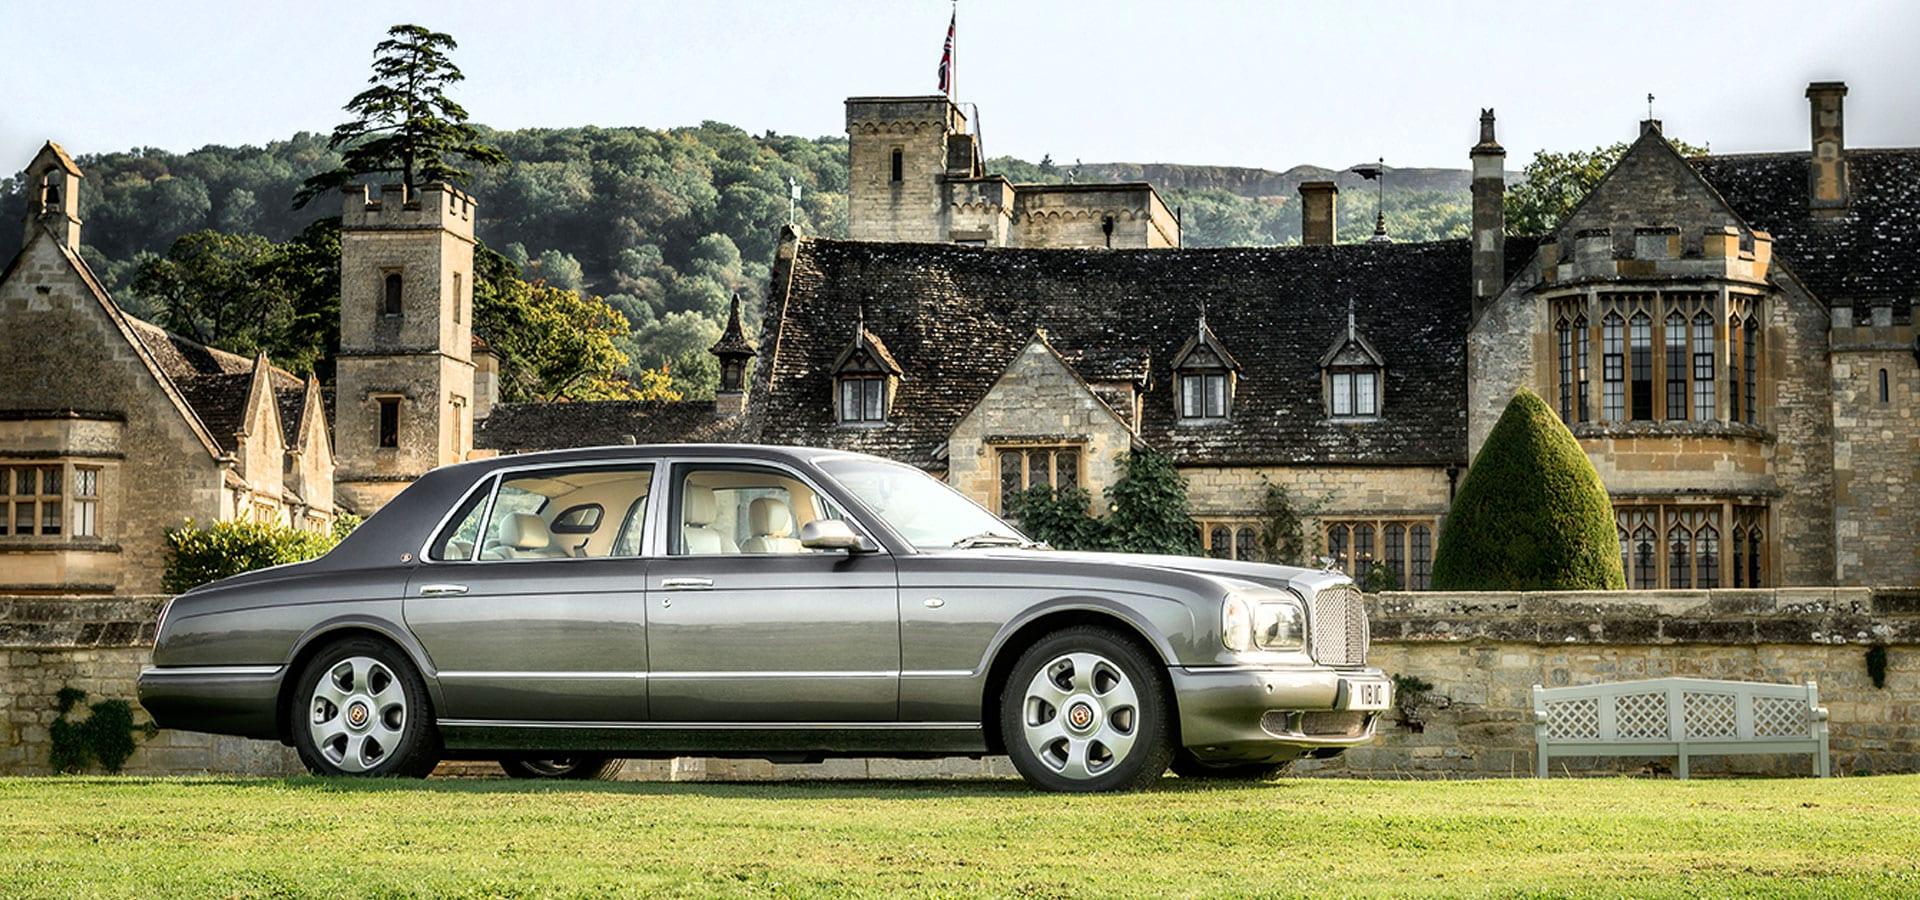 Bentley Arnage wedding car outside Ellenborough Park, Cheltenham